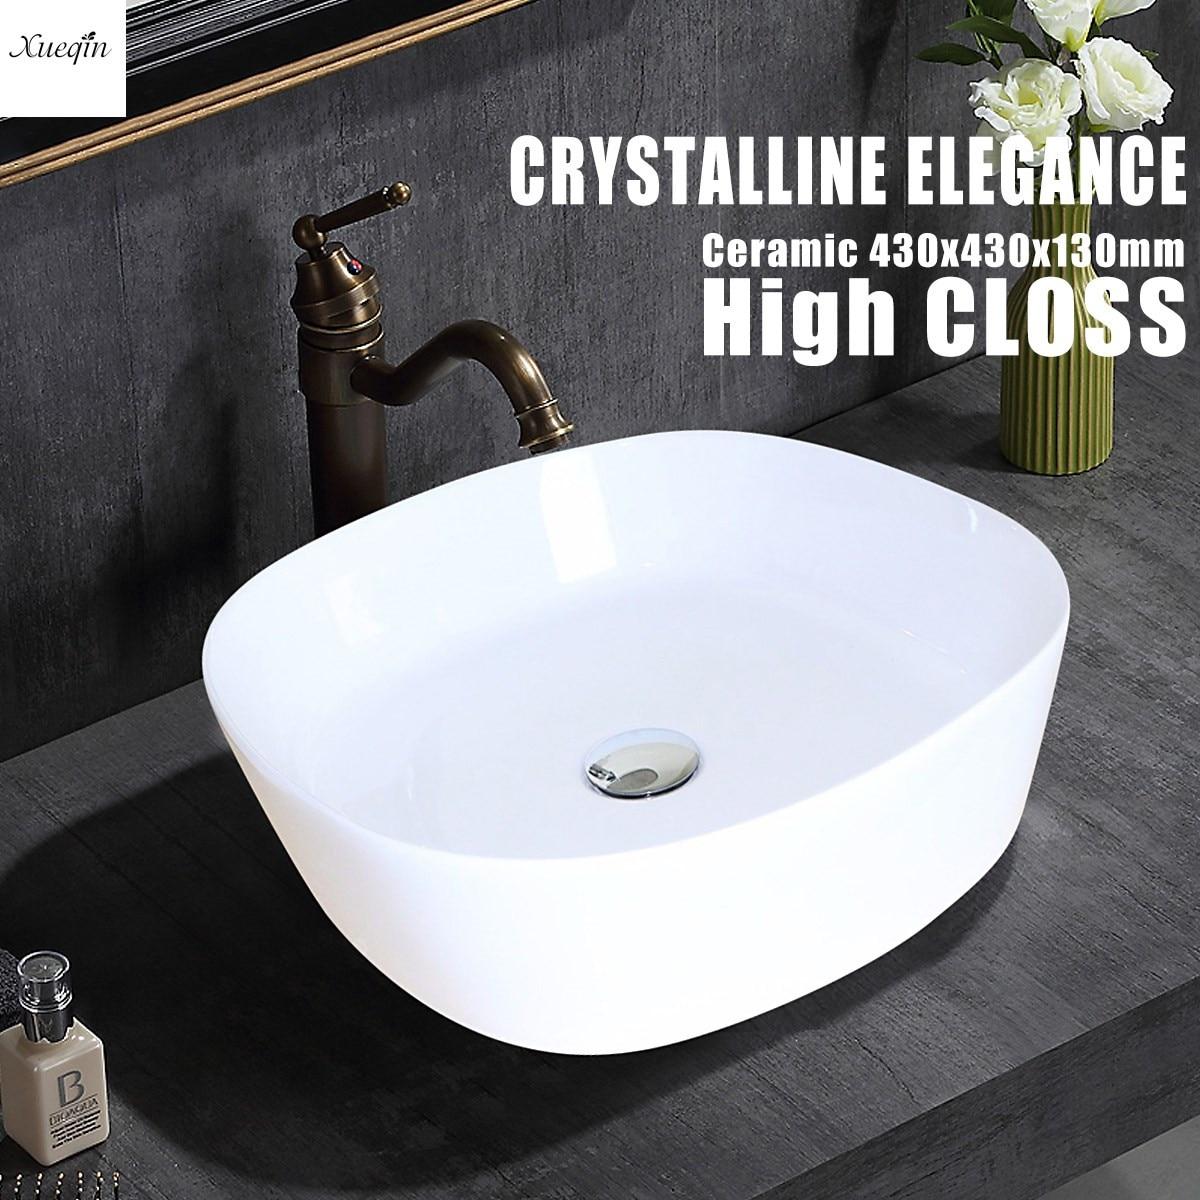 1Pcs Xueqin White Square Bathroom Porcelain Ceramic Vessel Sink ...